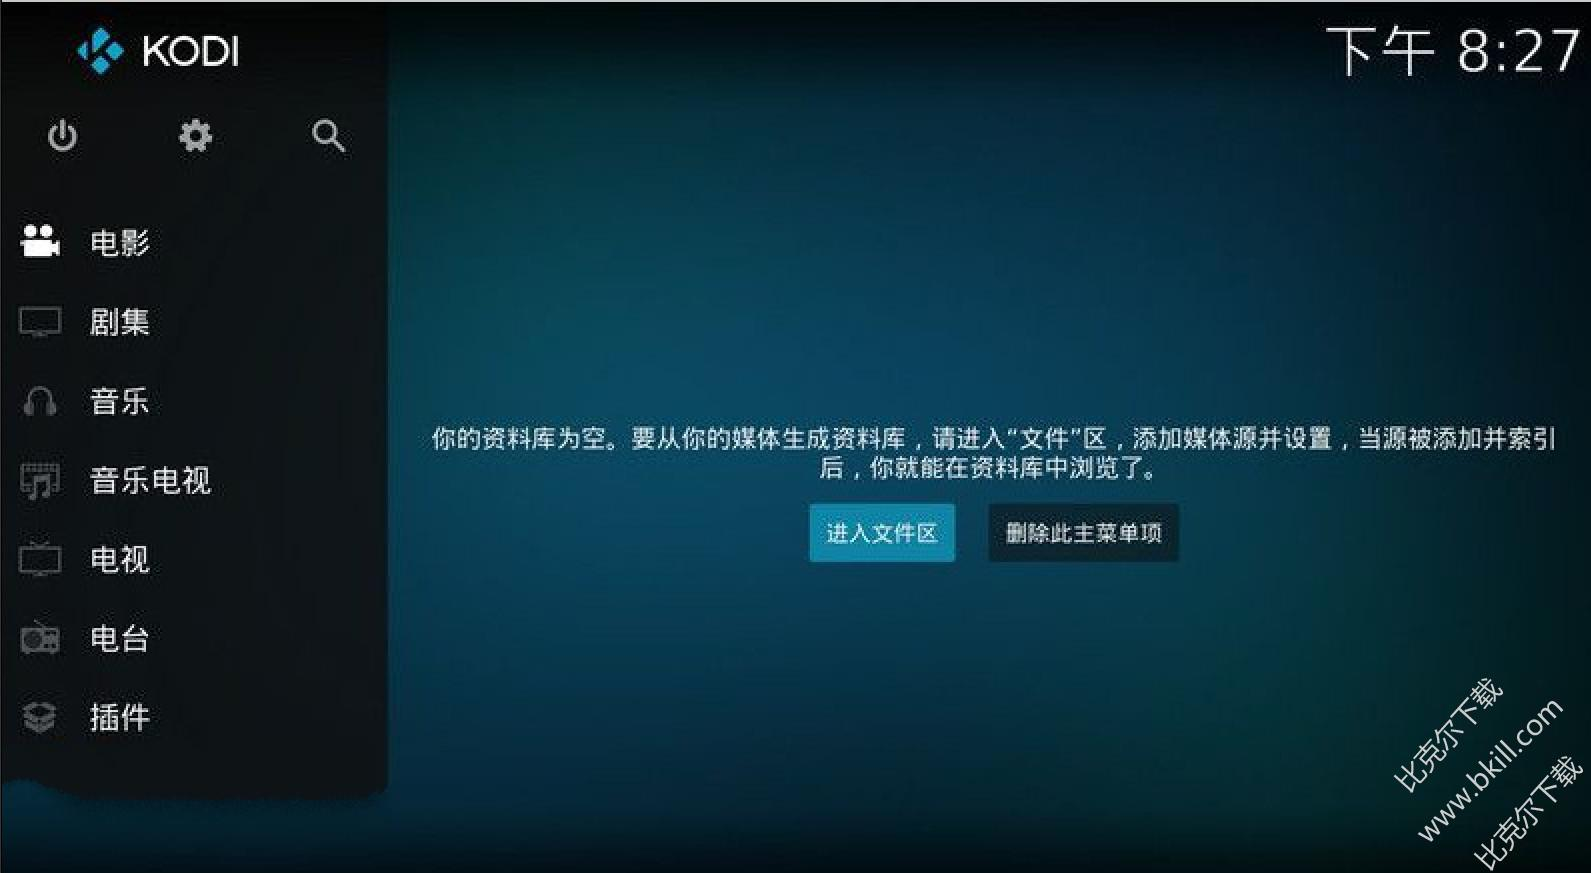 kodi mac 中文版